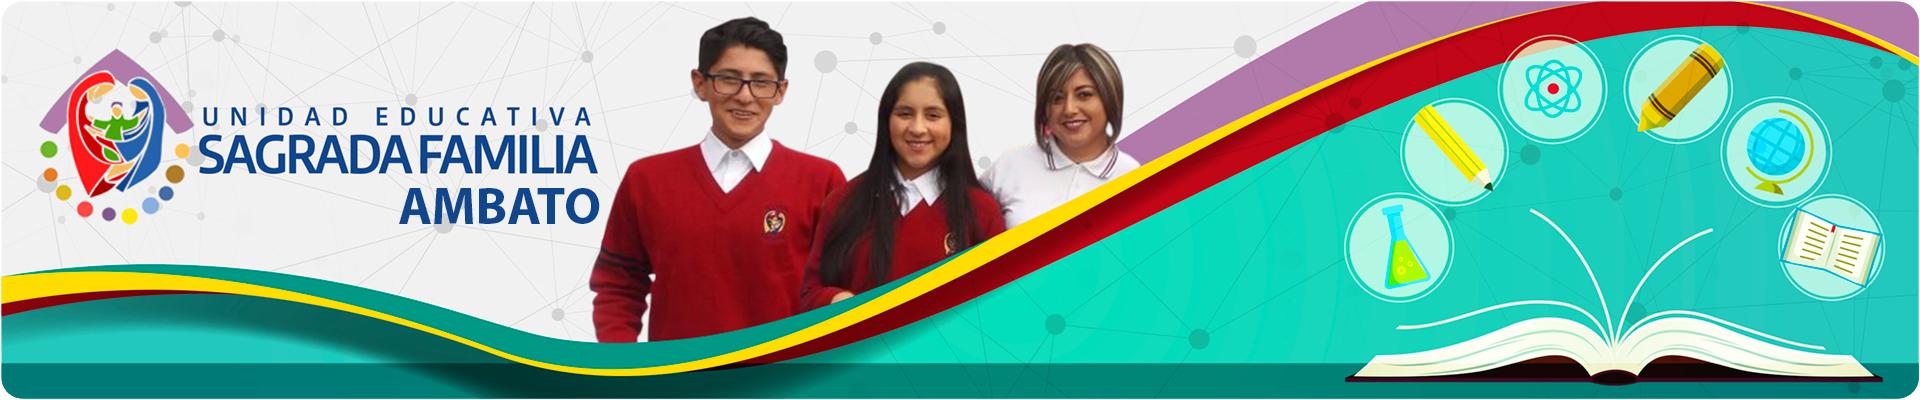 Unidad Educativa Sagrada Familia, Ambato